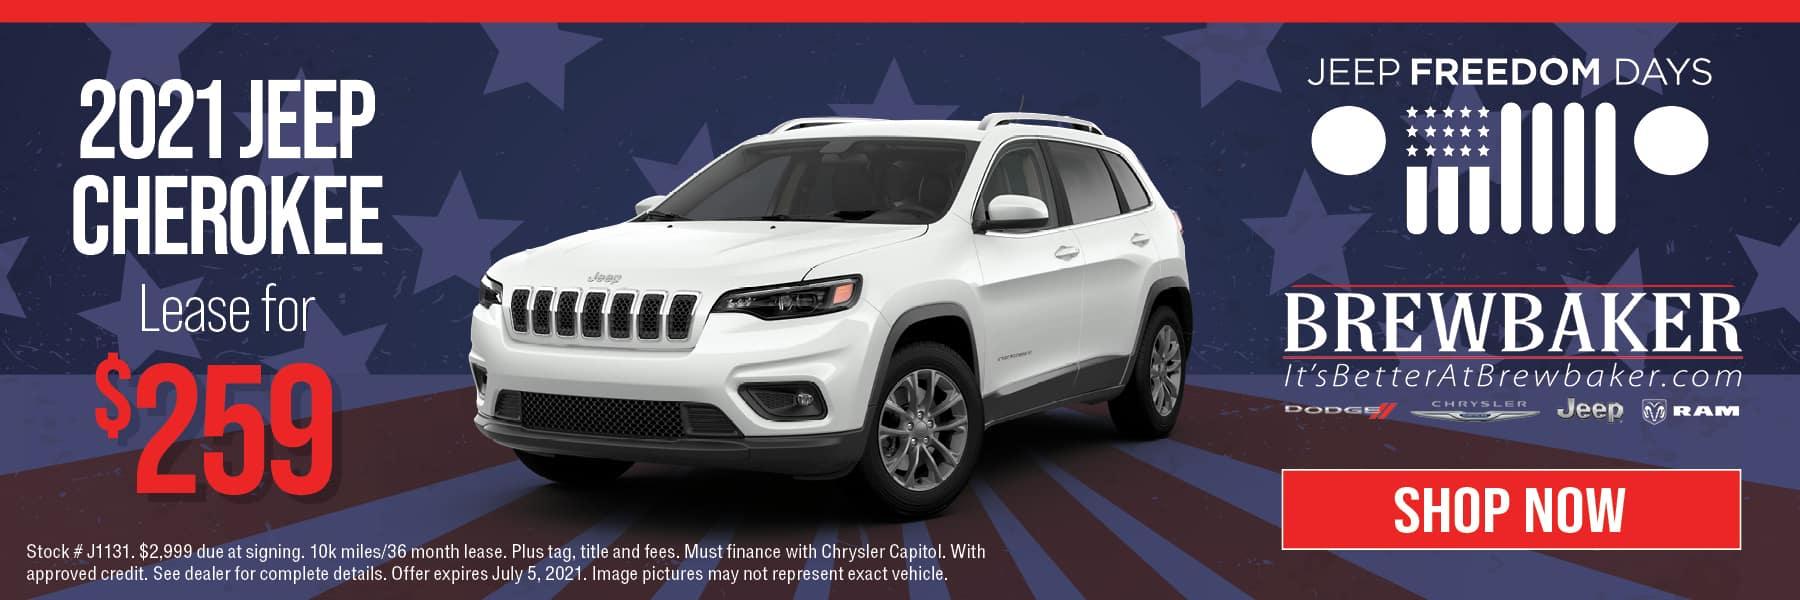 Jeep_Cherokee_June_1800x600